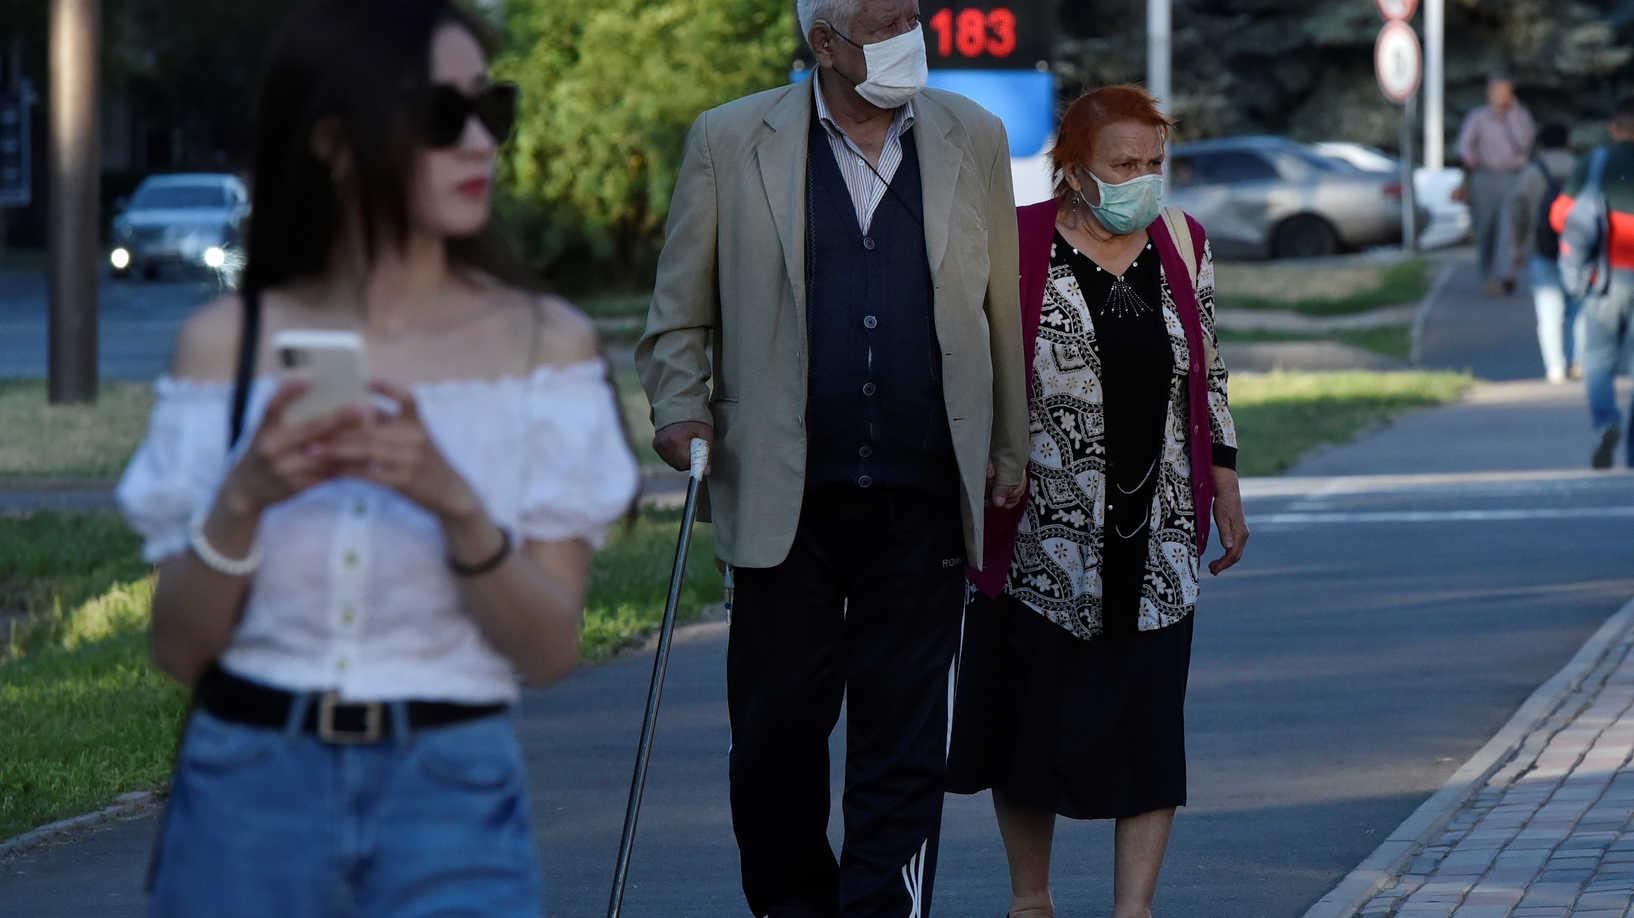 ئاماژهی چین   وه بیماری نەناسریاگیگ لە کازاخستان ك لە کۆڕۆنا دڕندەتر